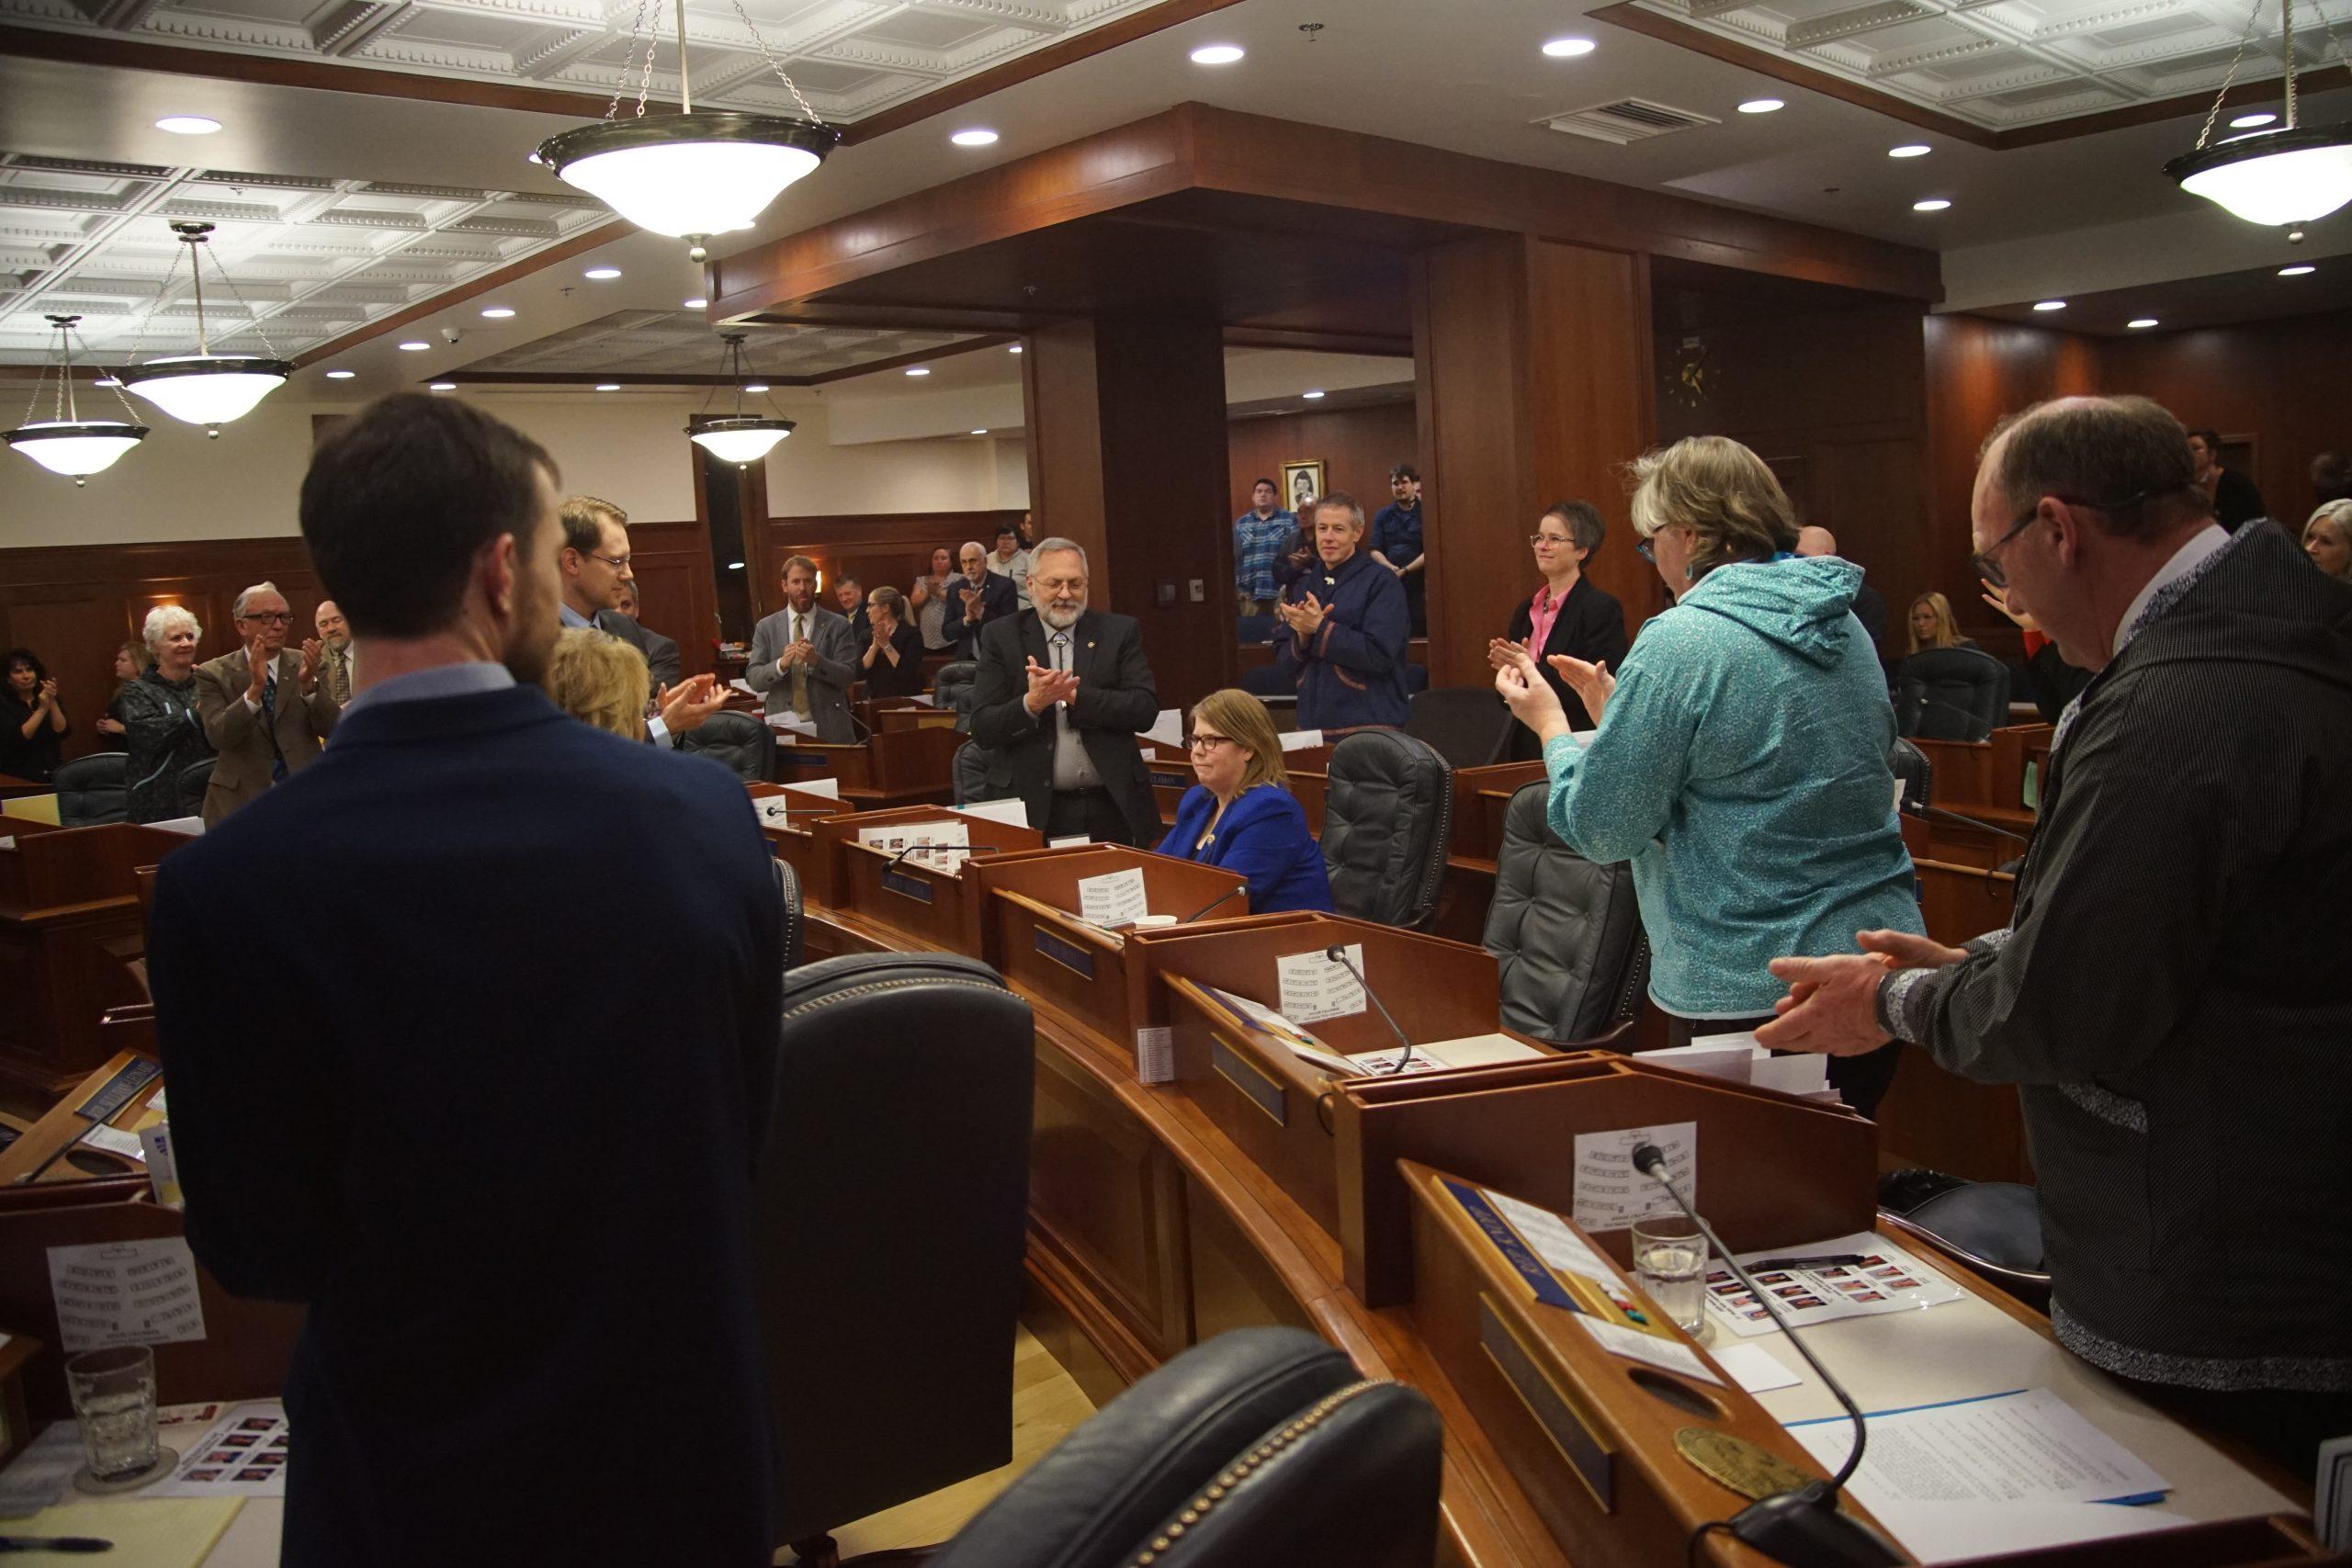 Speaker: Representative Wilson gave her all in the Legislature for more than a decade